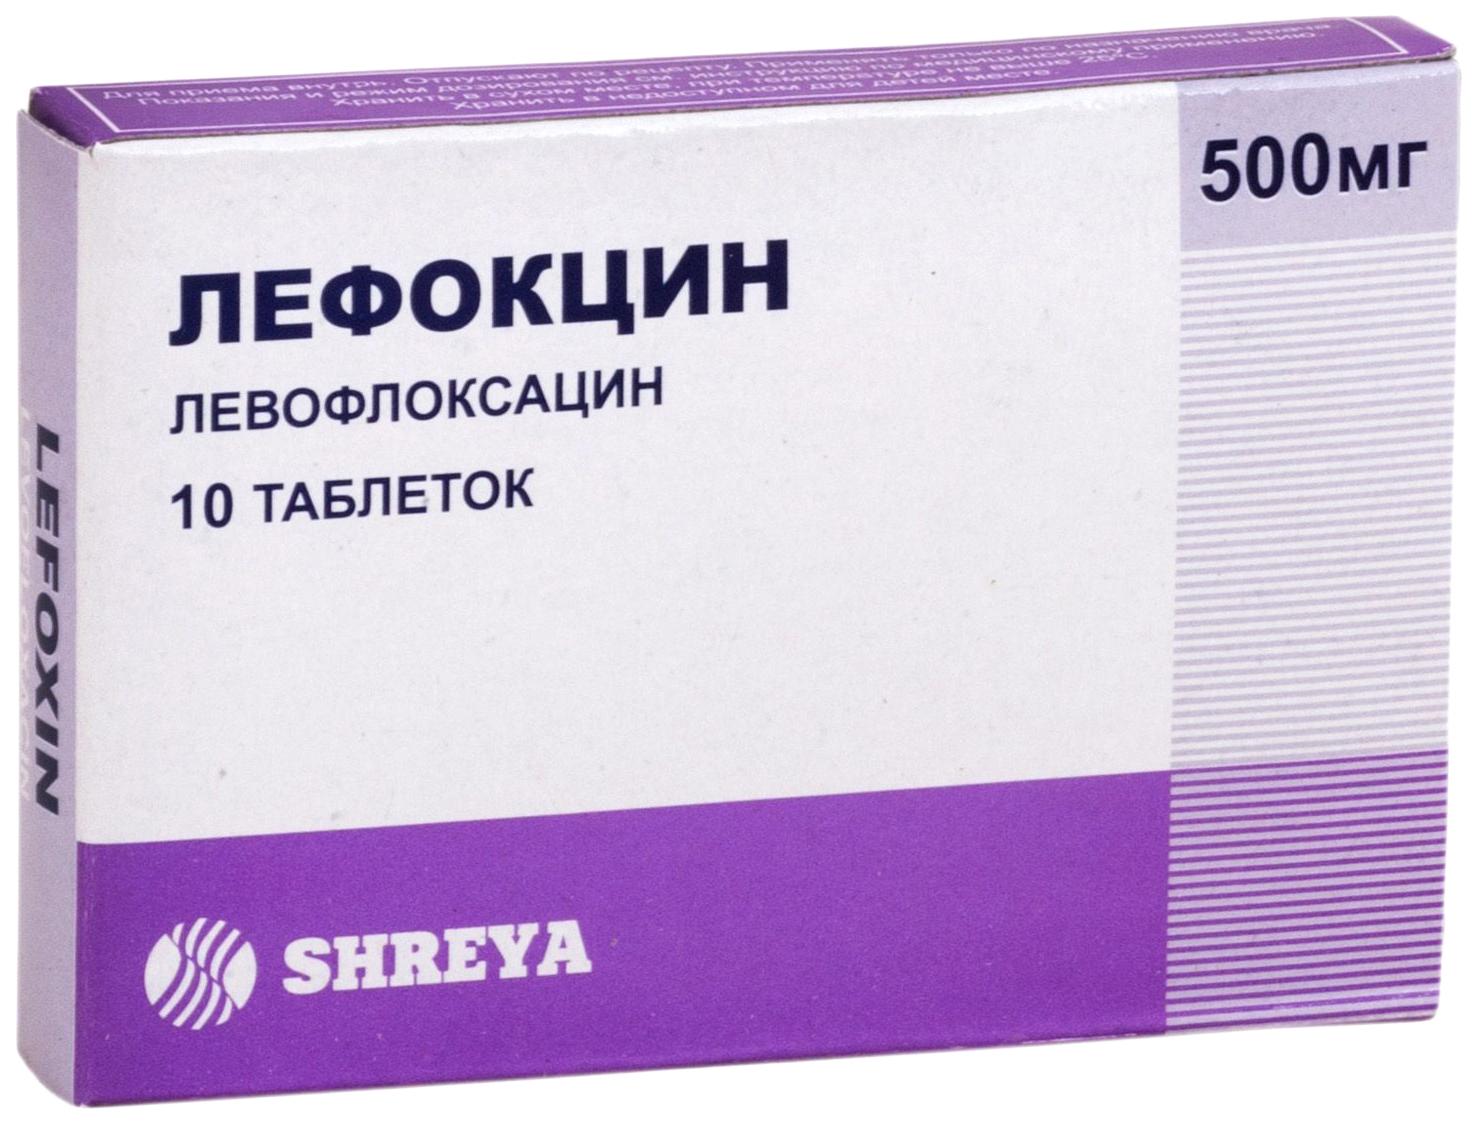 ЛЕФОКЦИН таблетки 500 мг 10 шт.